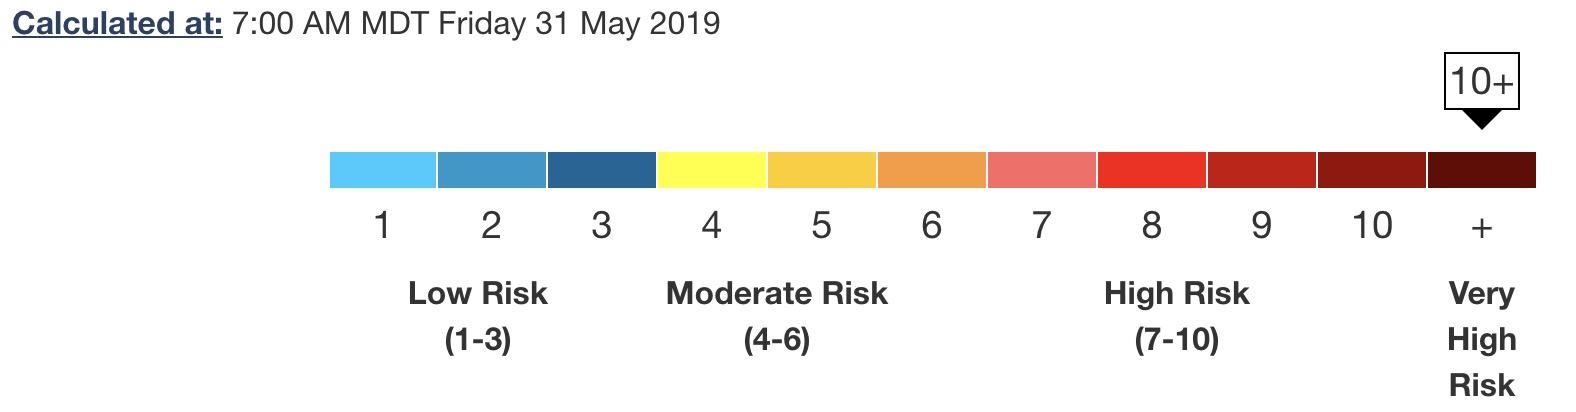 Calgary Air Quality, May 31, 2019